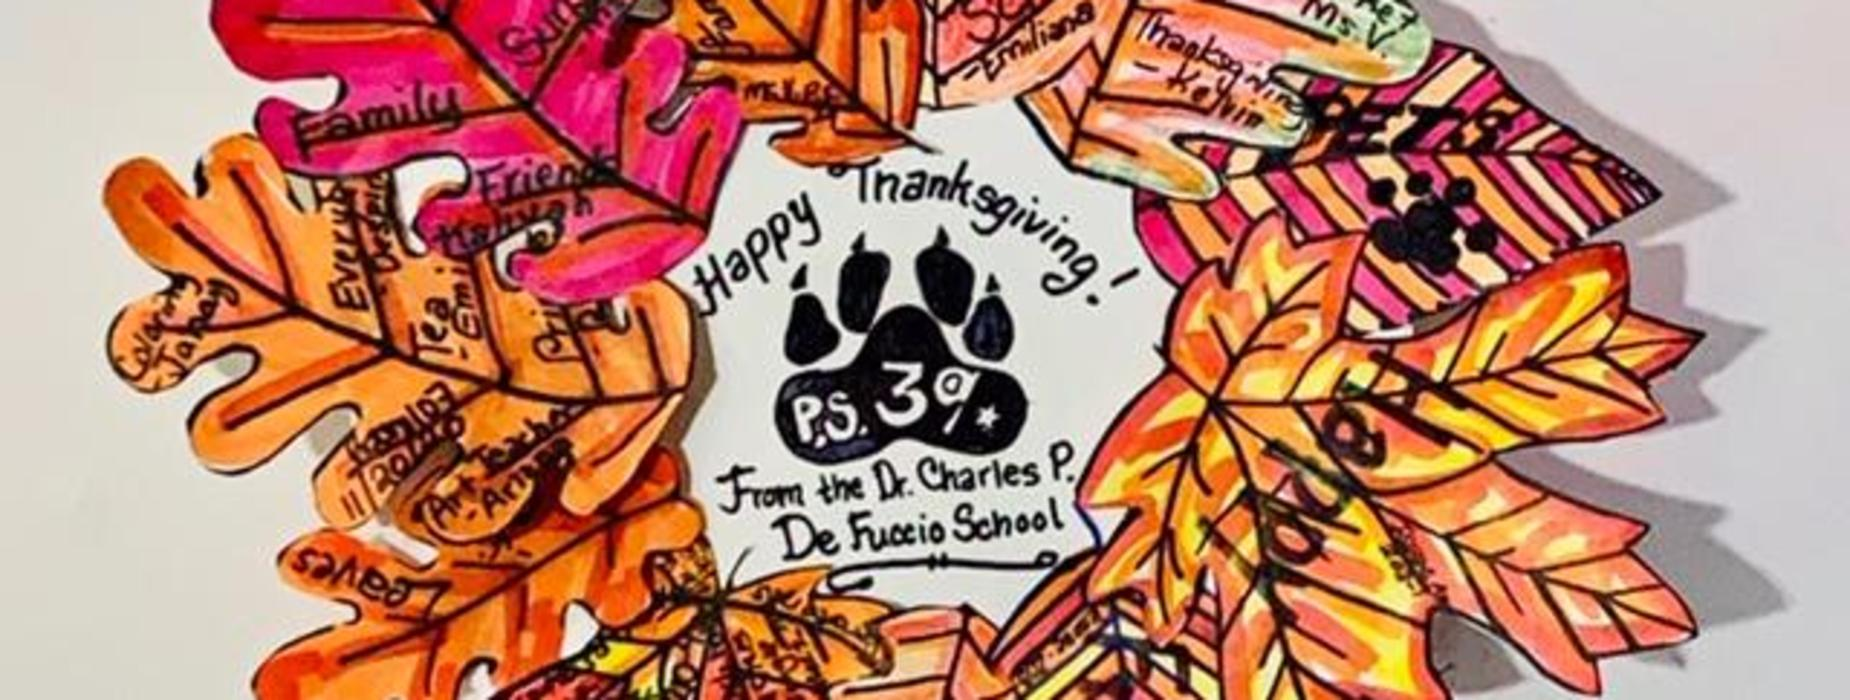 k-3 Art Classes' Gratitude Wreath 2020